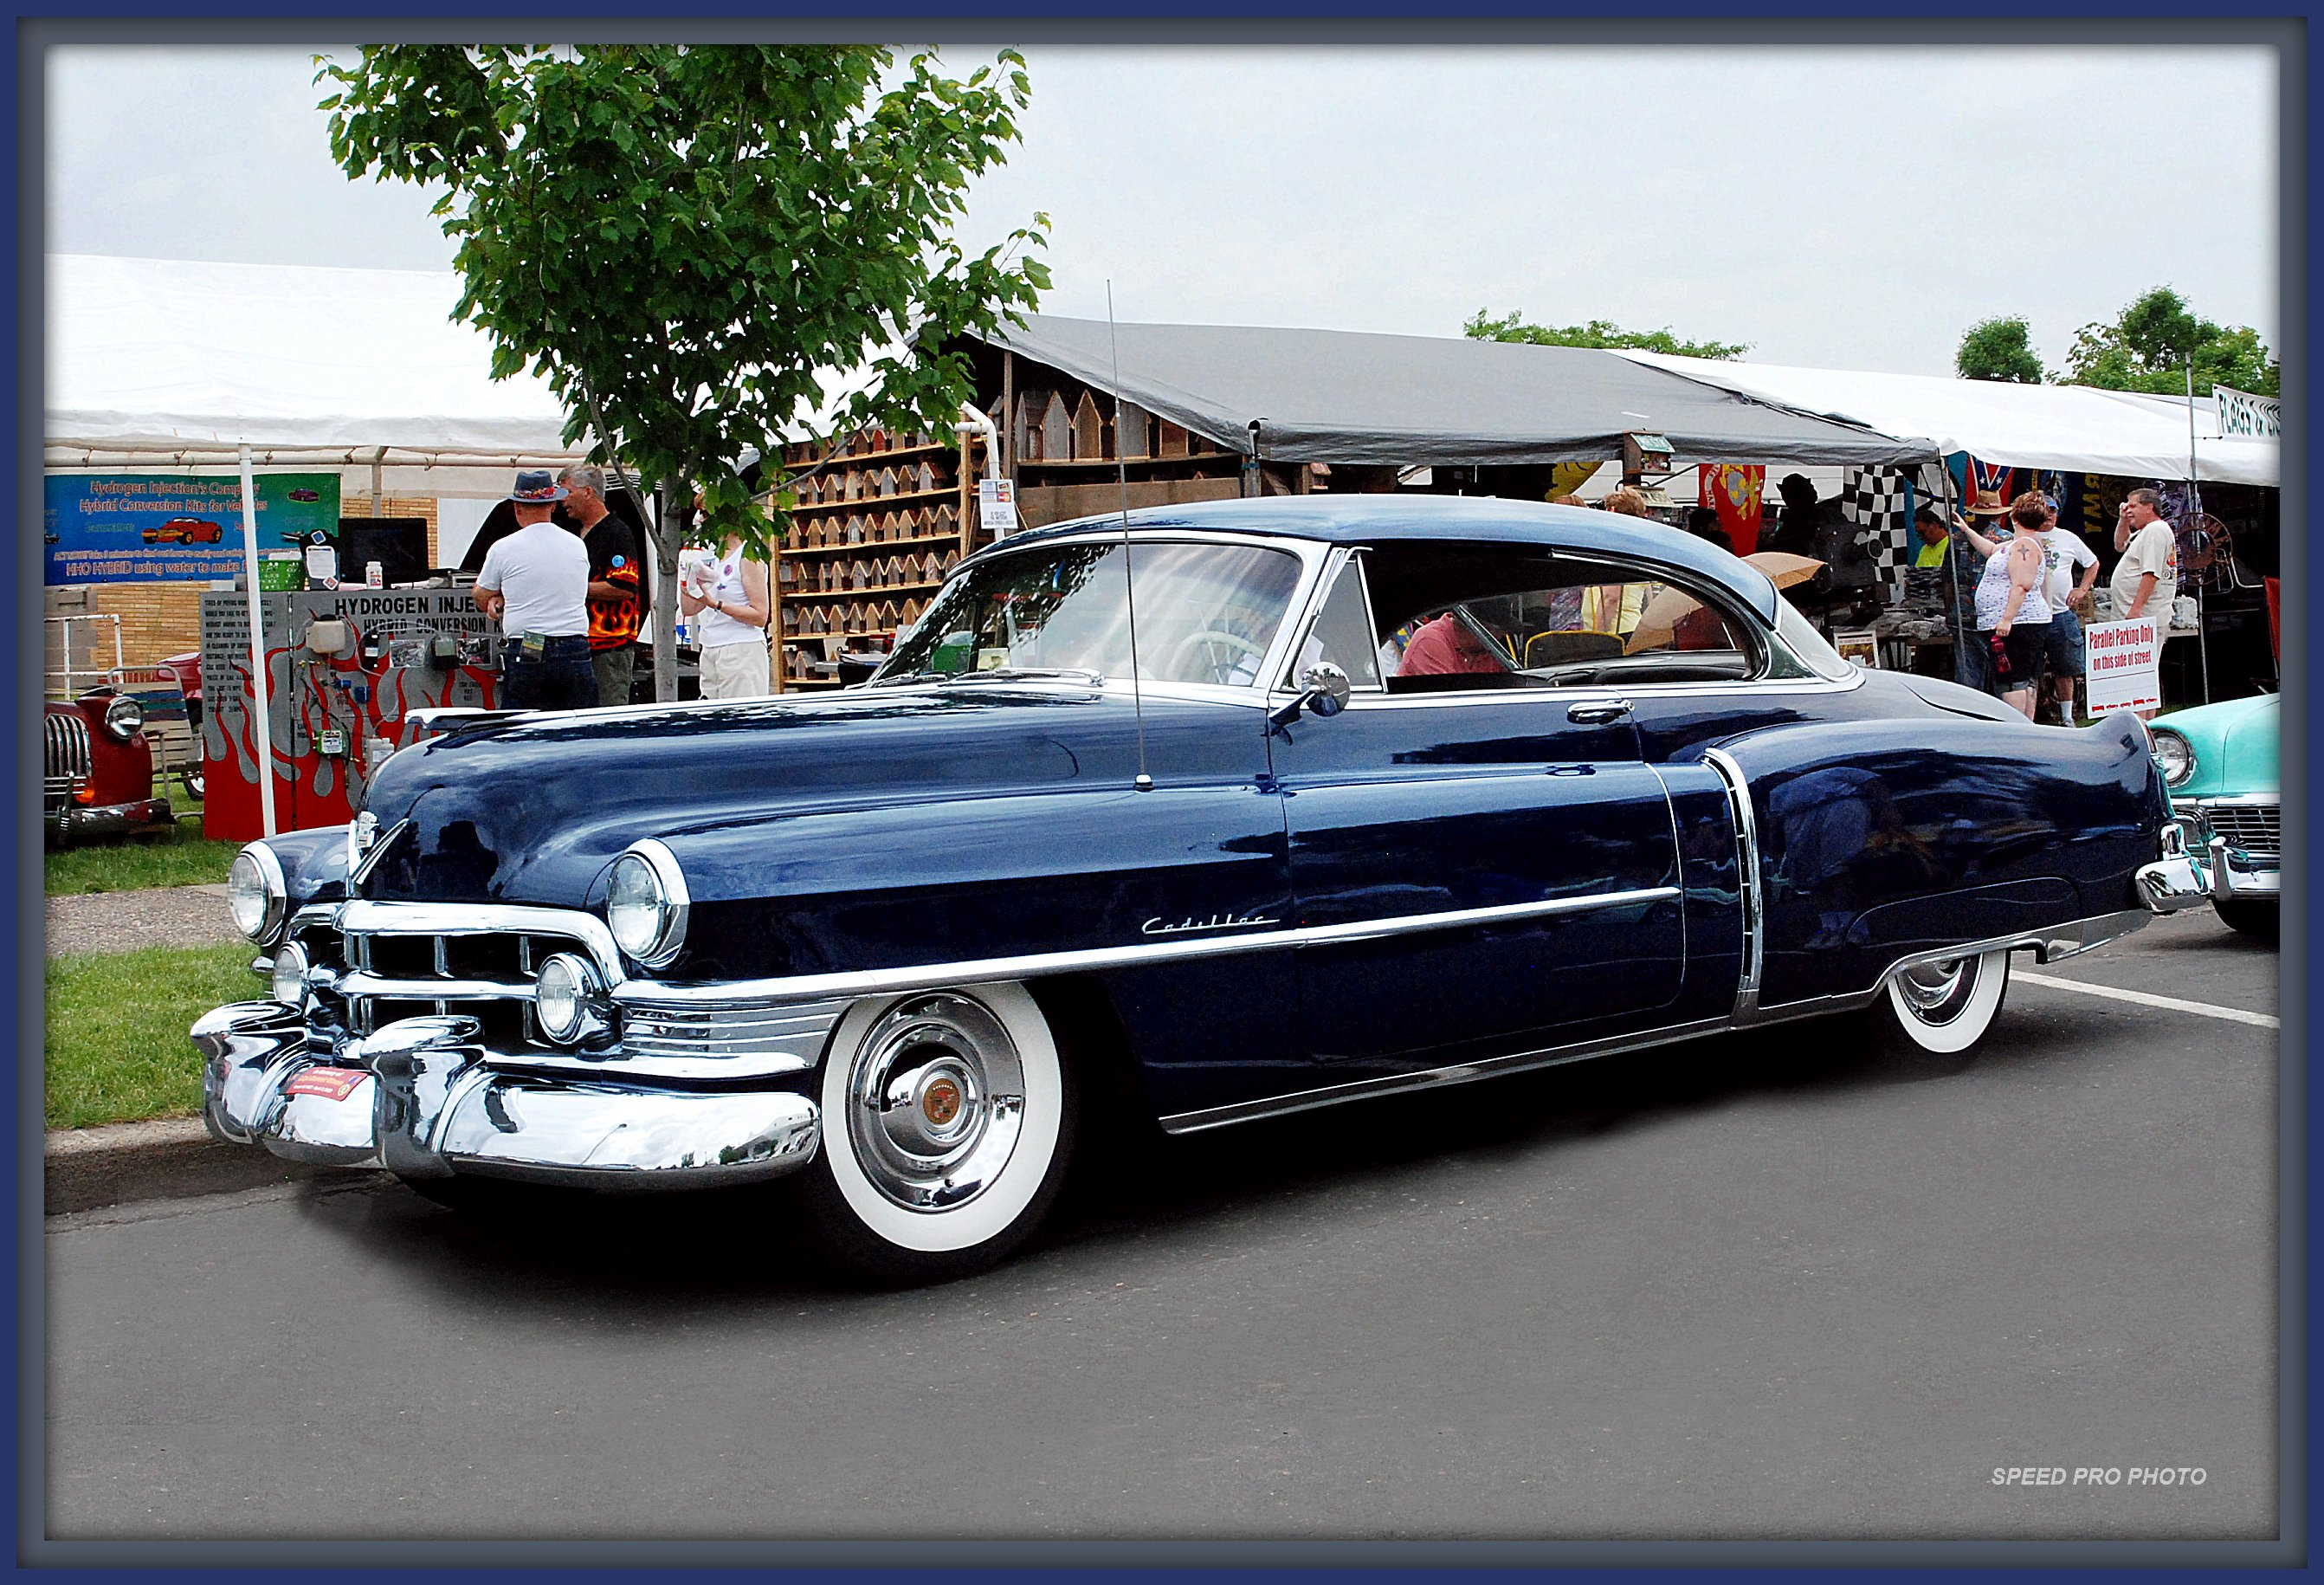 Cadillac Cars For Sale Nz